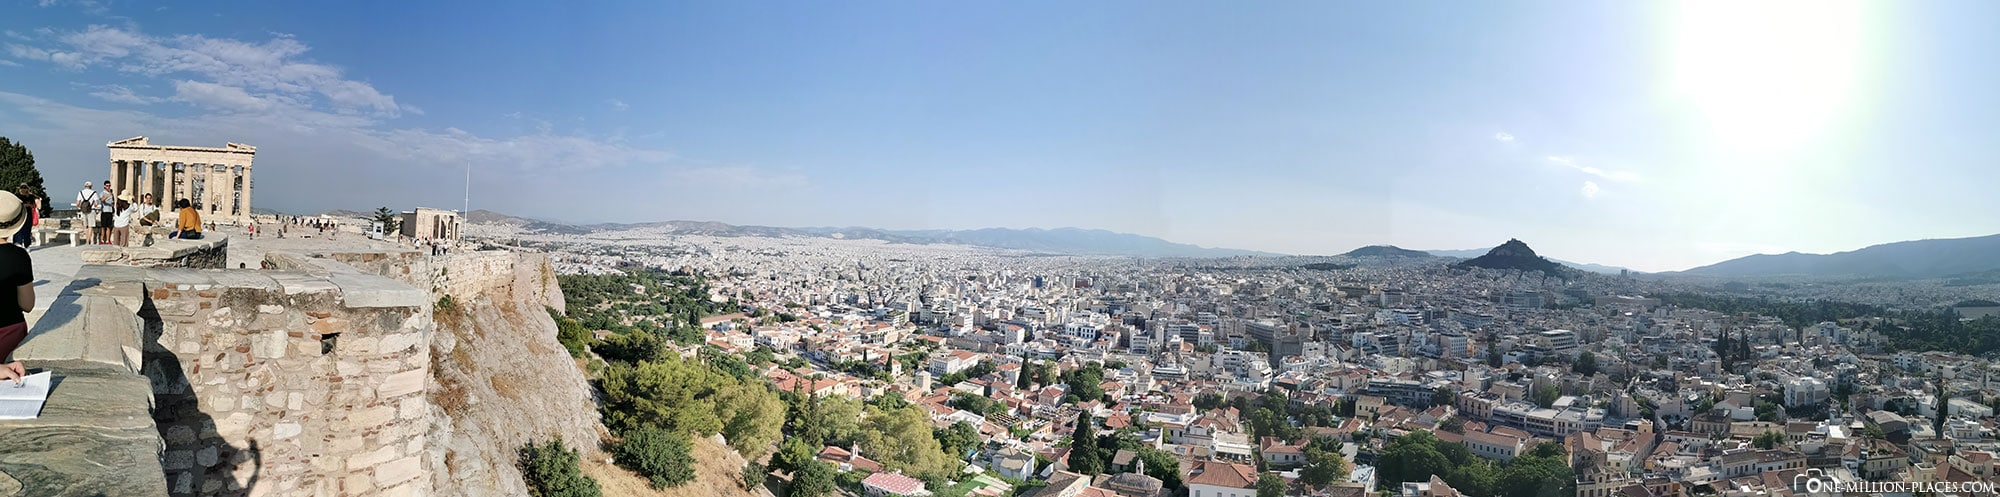 Akropolis, Athen, Panoramabild